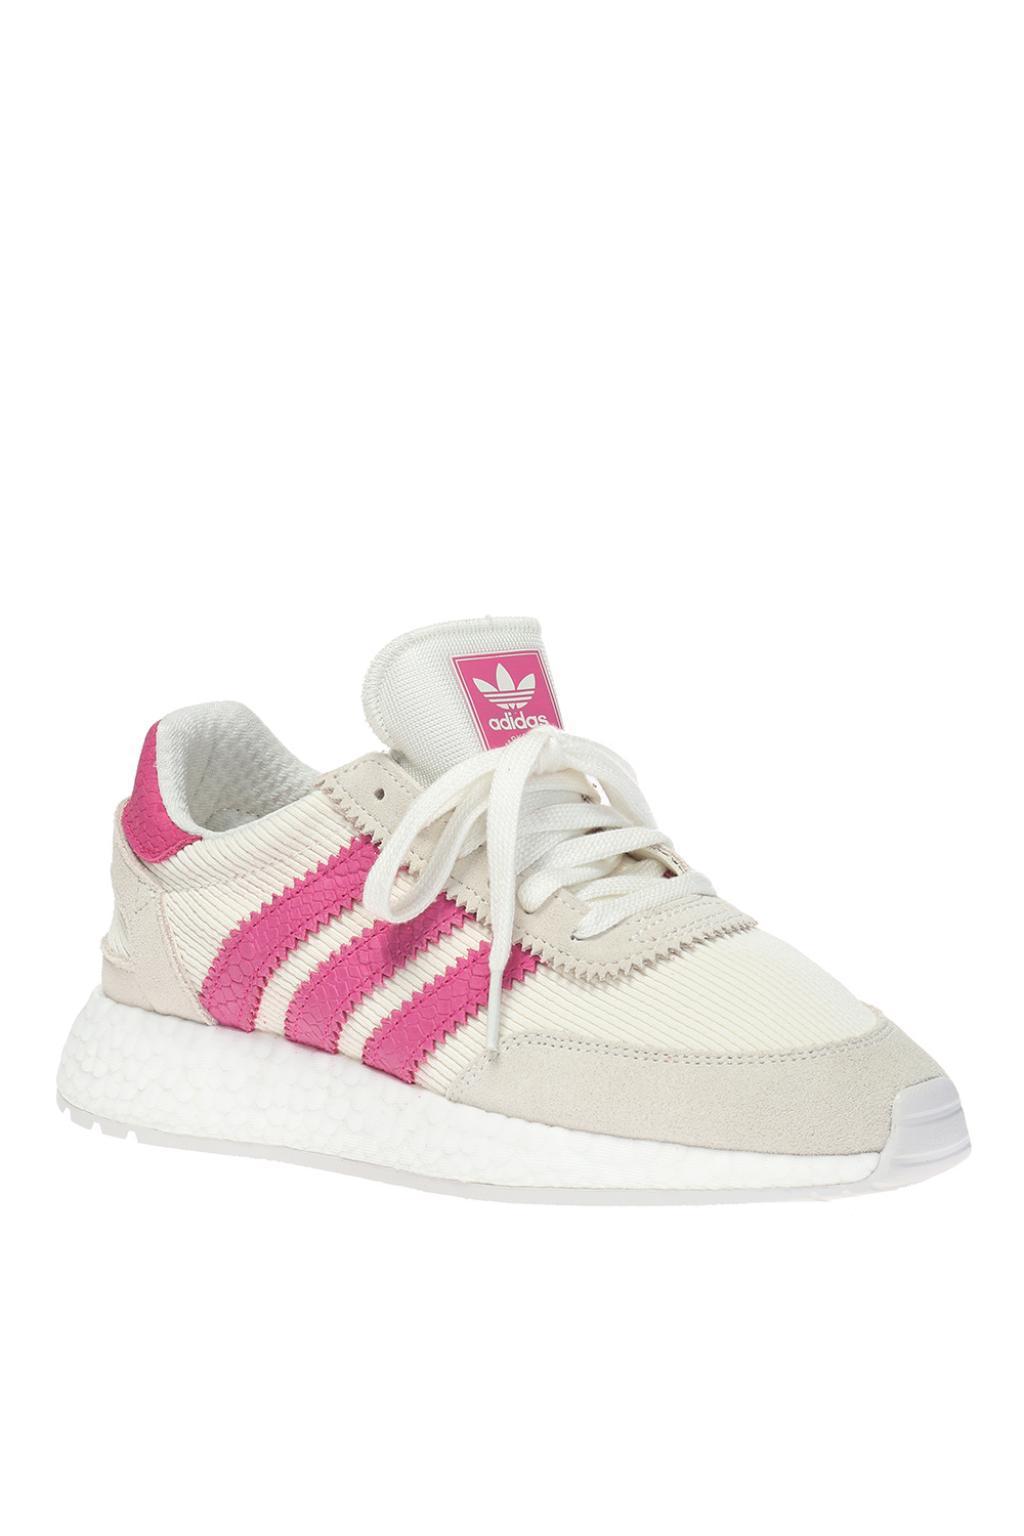 f38df7b1c209bc Adidas Originals - White  i-5923  Sneakers - Lyst. View fullscreen